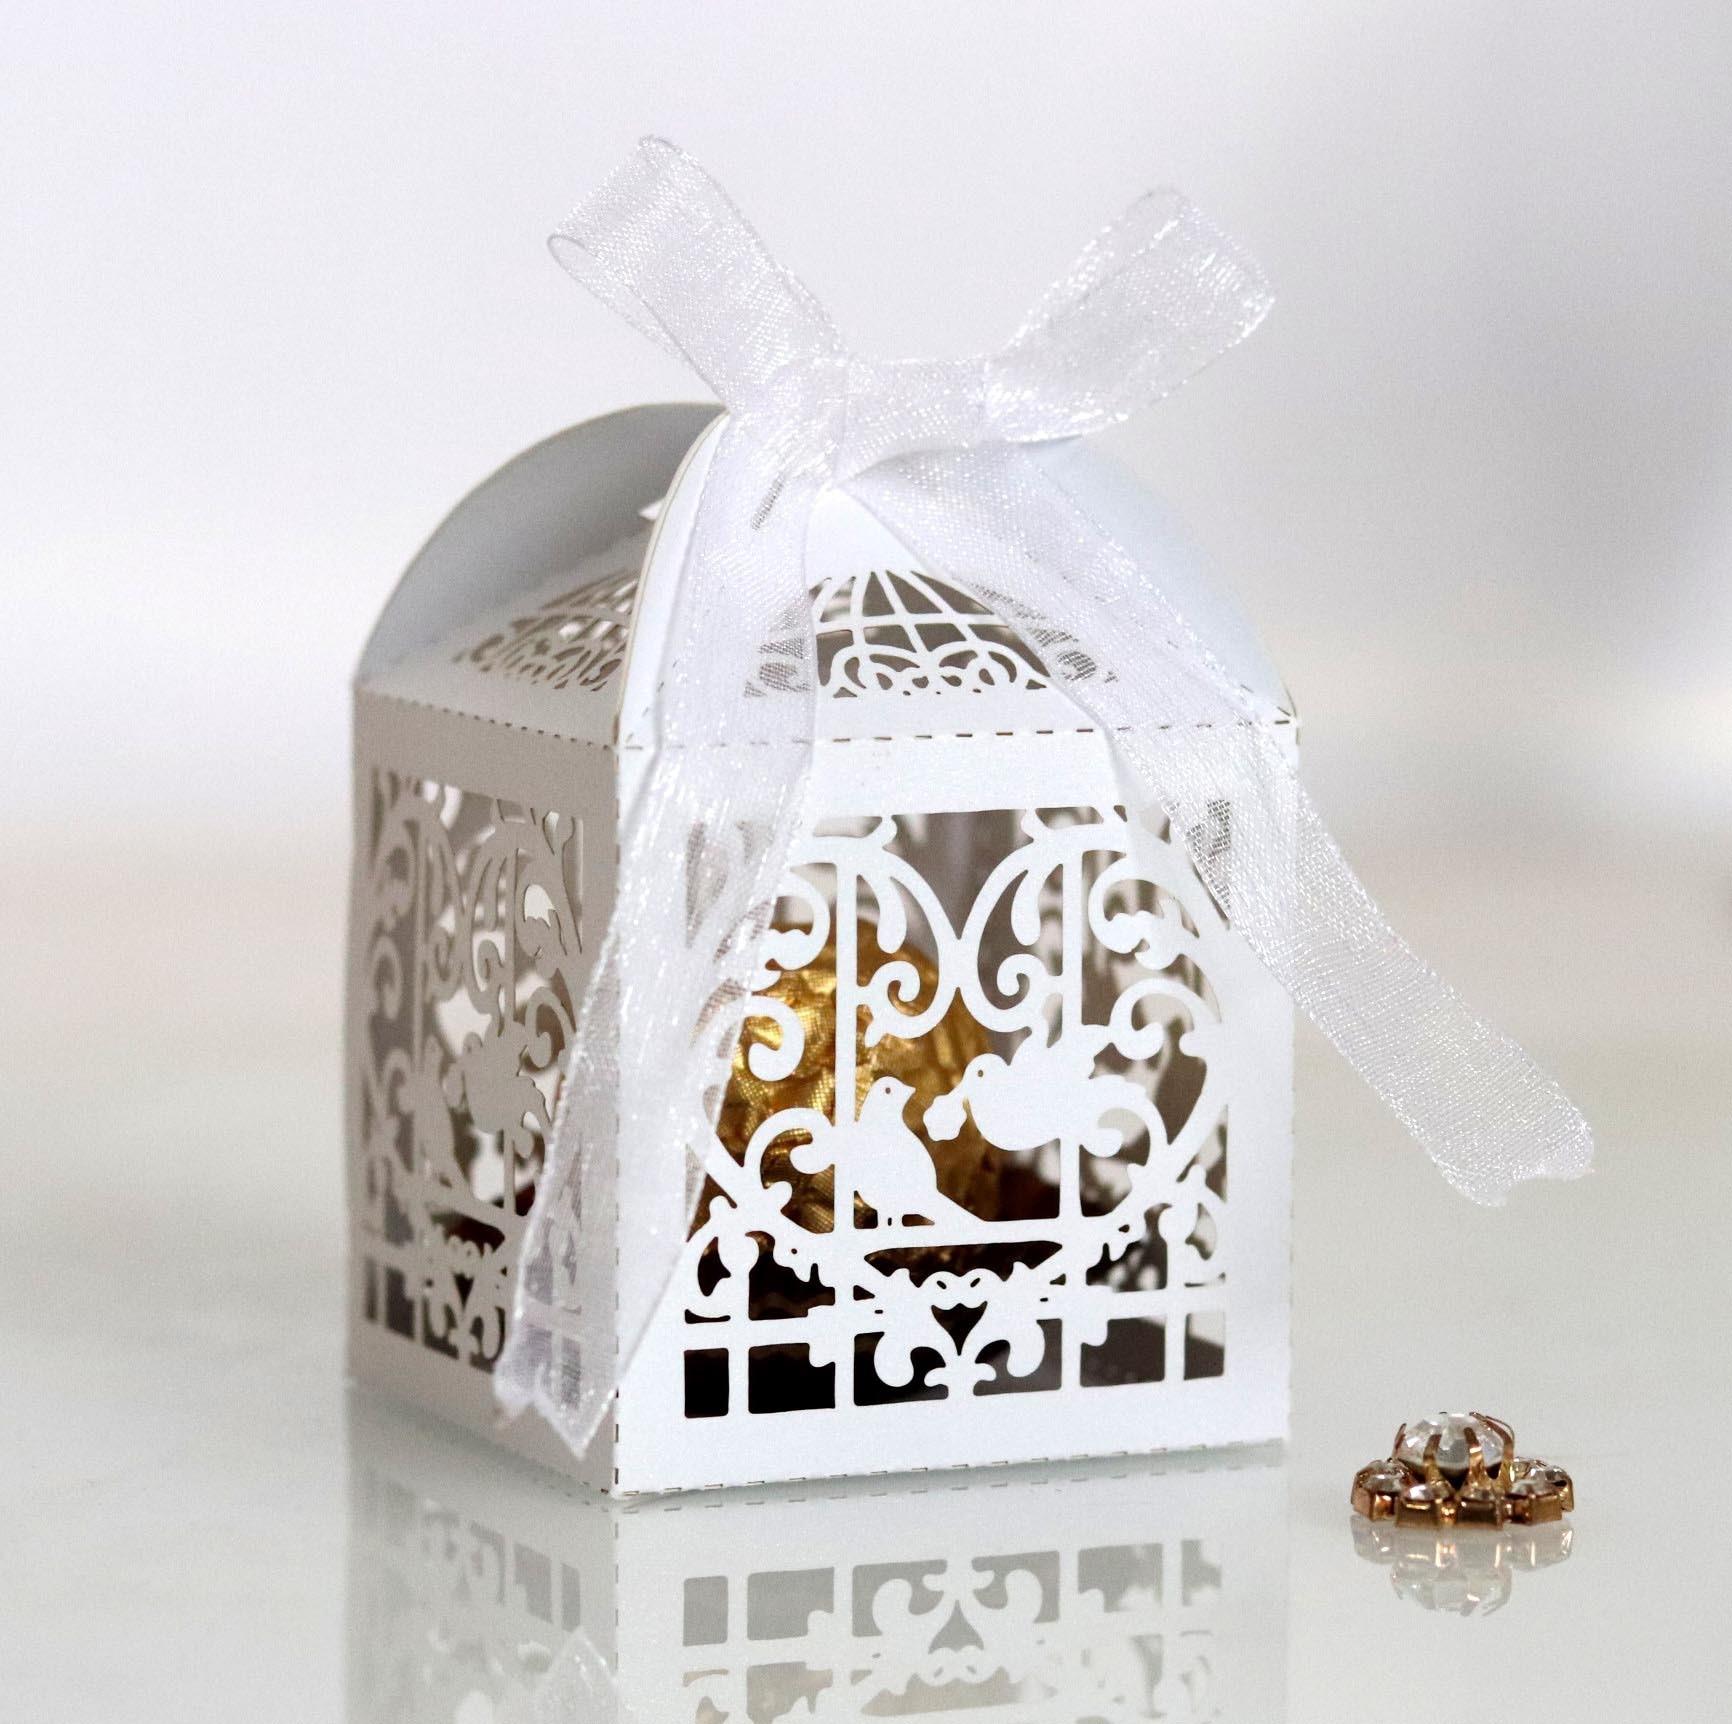 Corte por láser para bodas cajas de Favor de corte hueco amor pájaros jaula en forma de caja de dulces